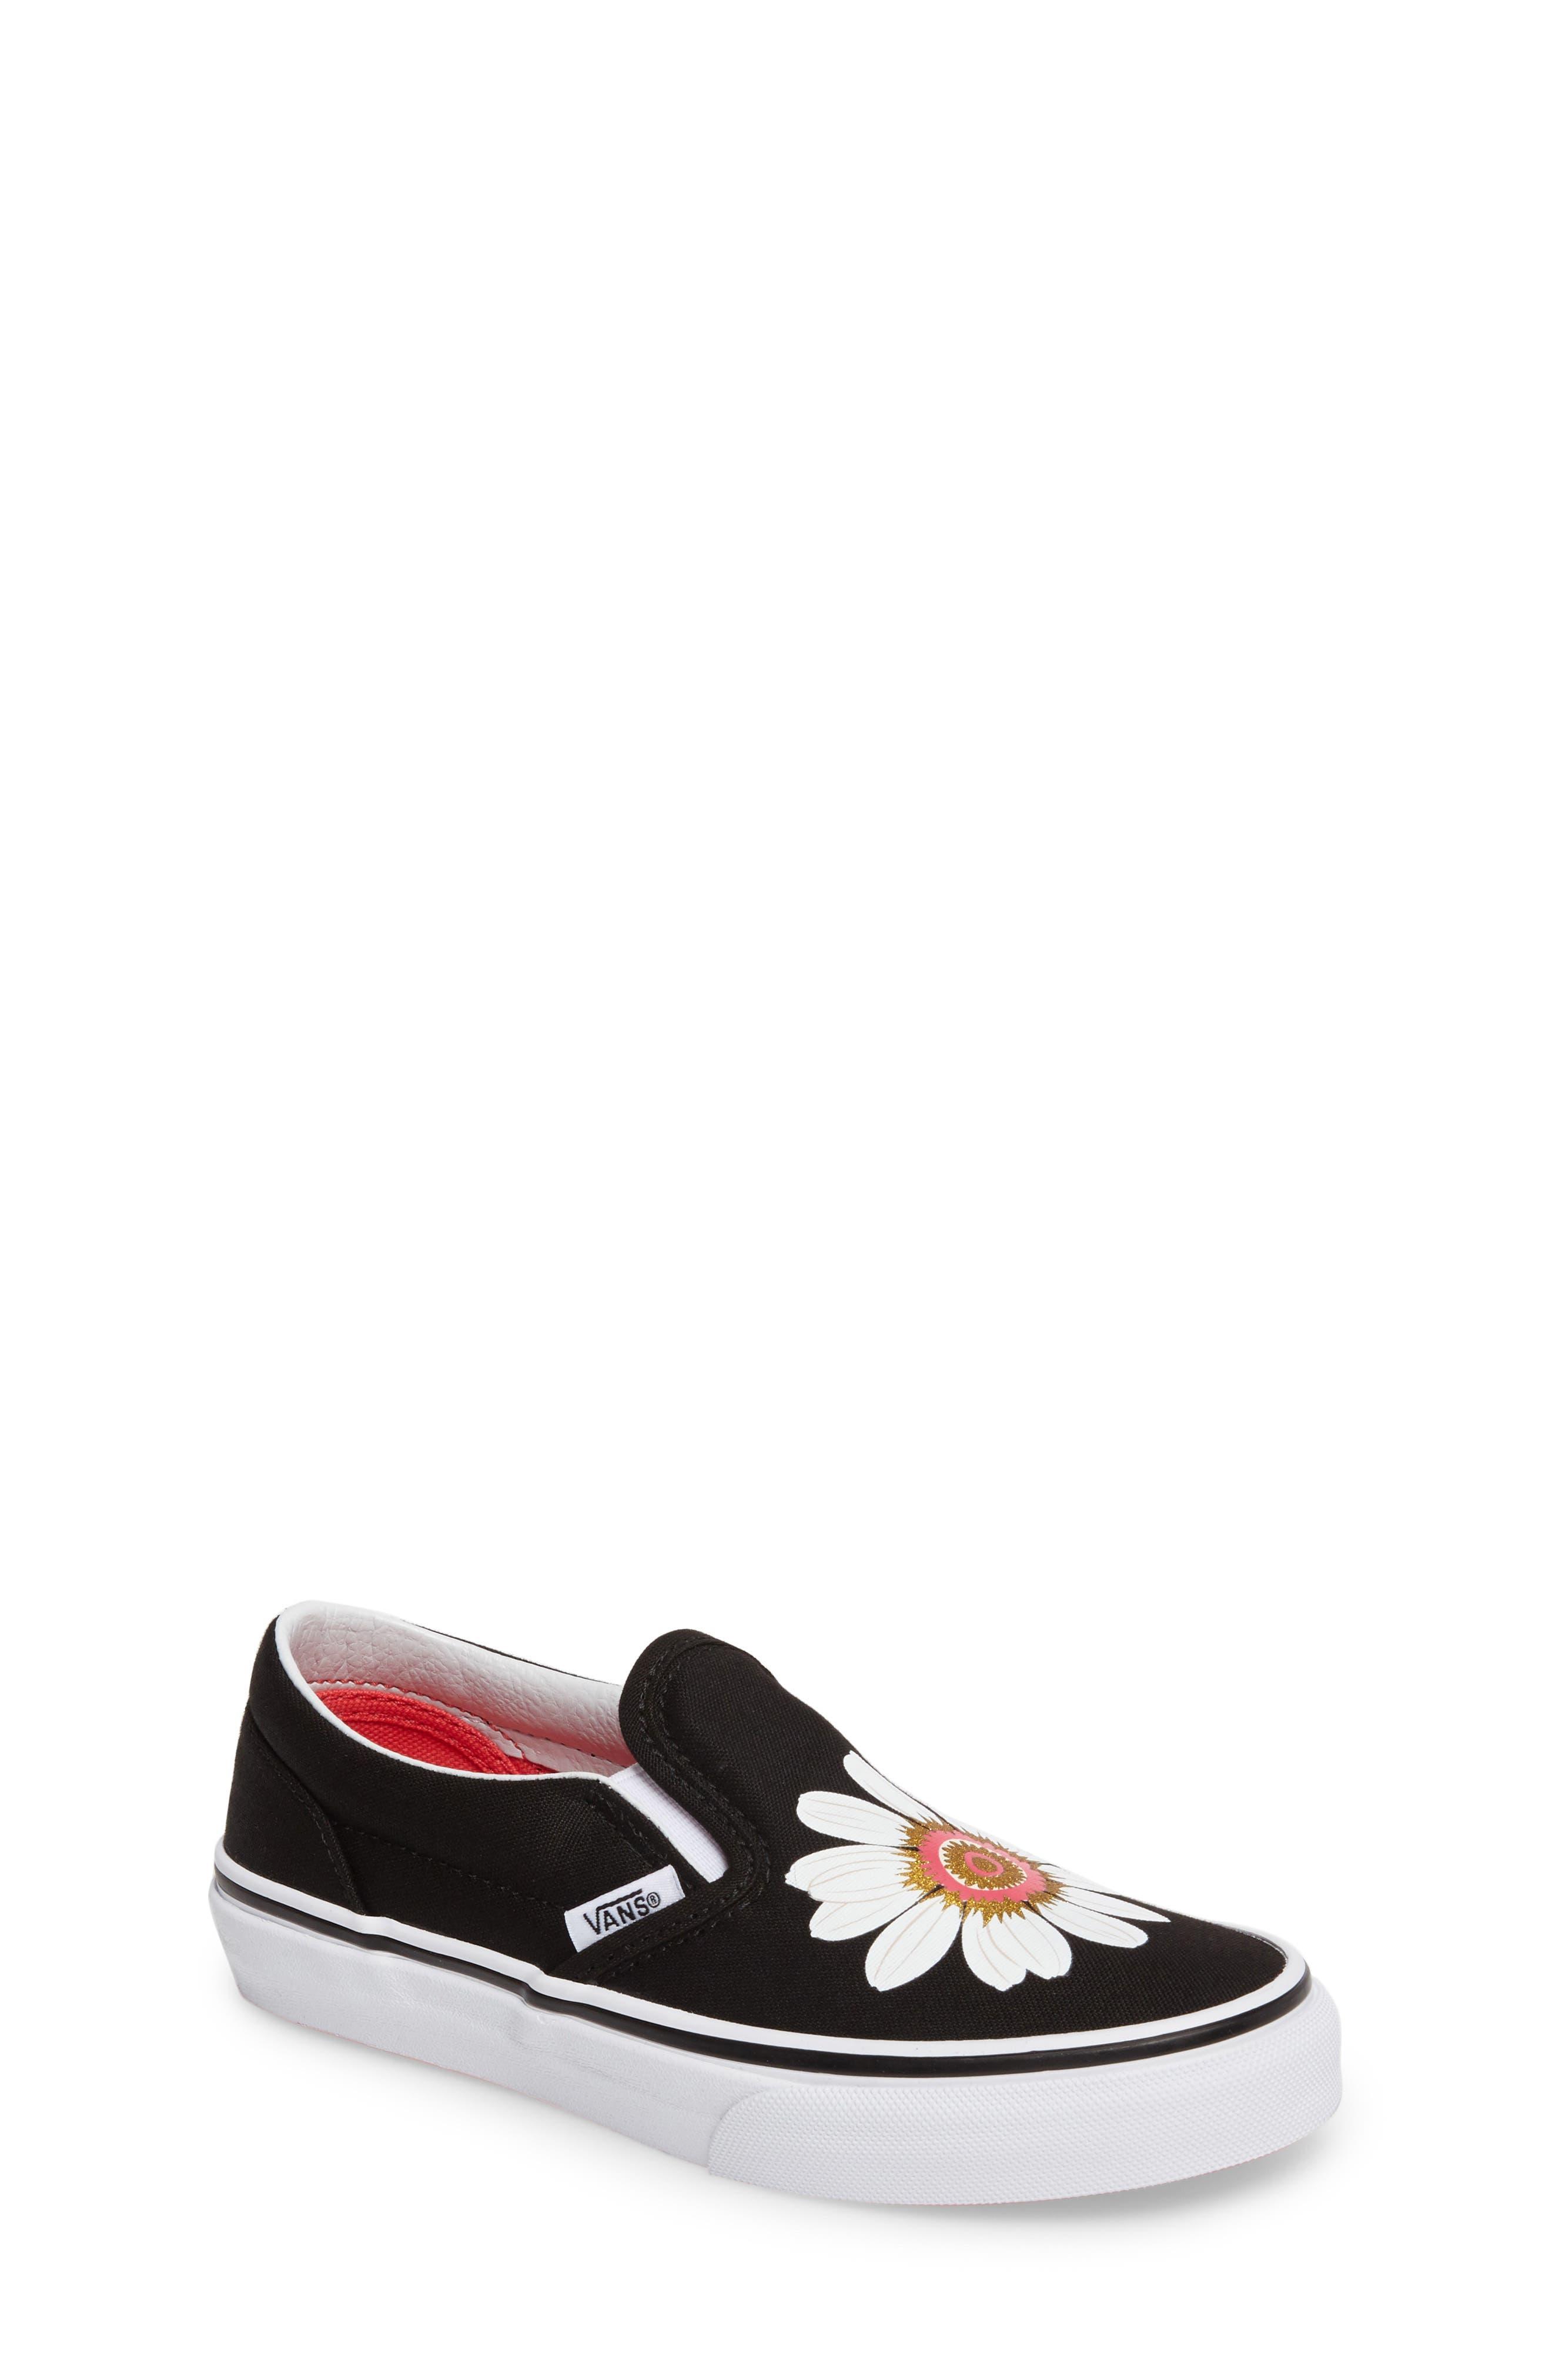 Alternate Image 1 Selected - Vans Classic Flower Slip-On Sneaker (Baby, Walker, Toddler, Little Kid & Big Kid)